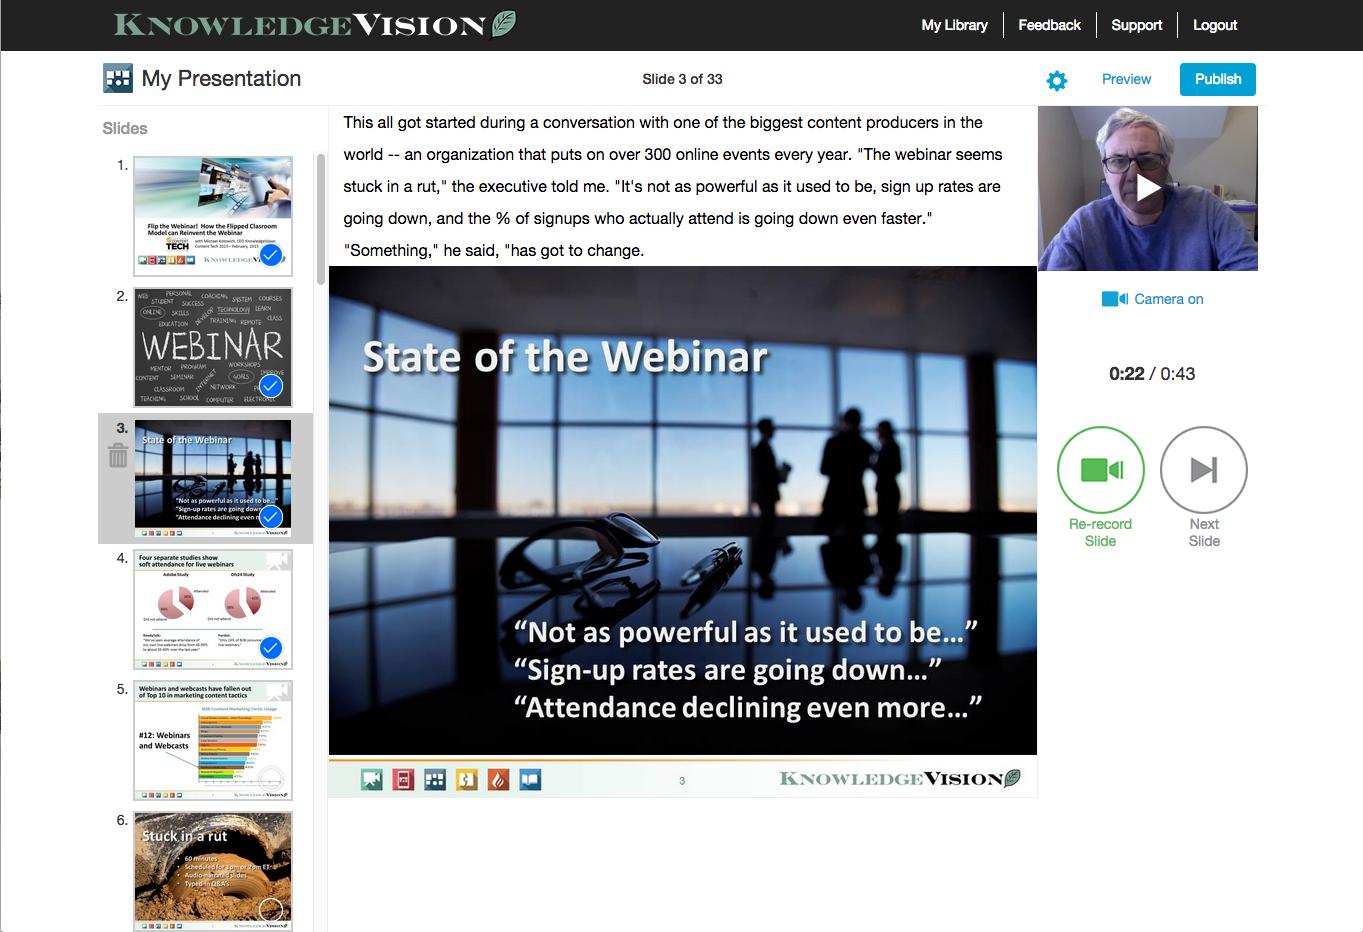 Recording a video presentation on Knovio Web